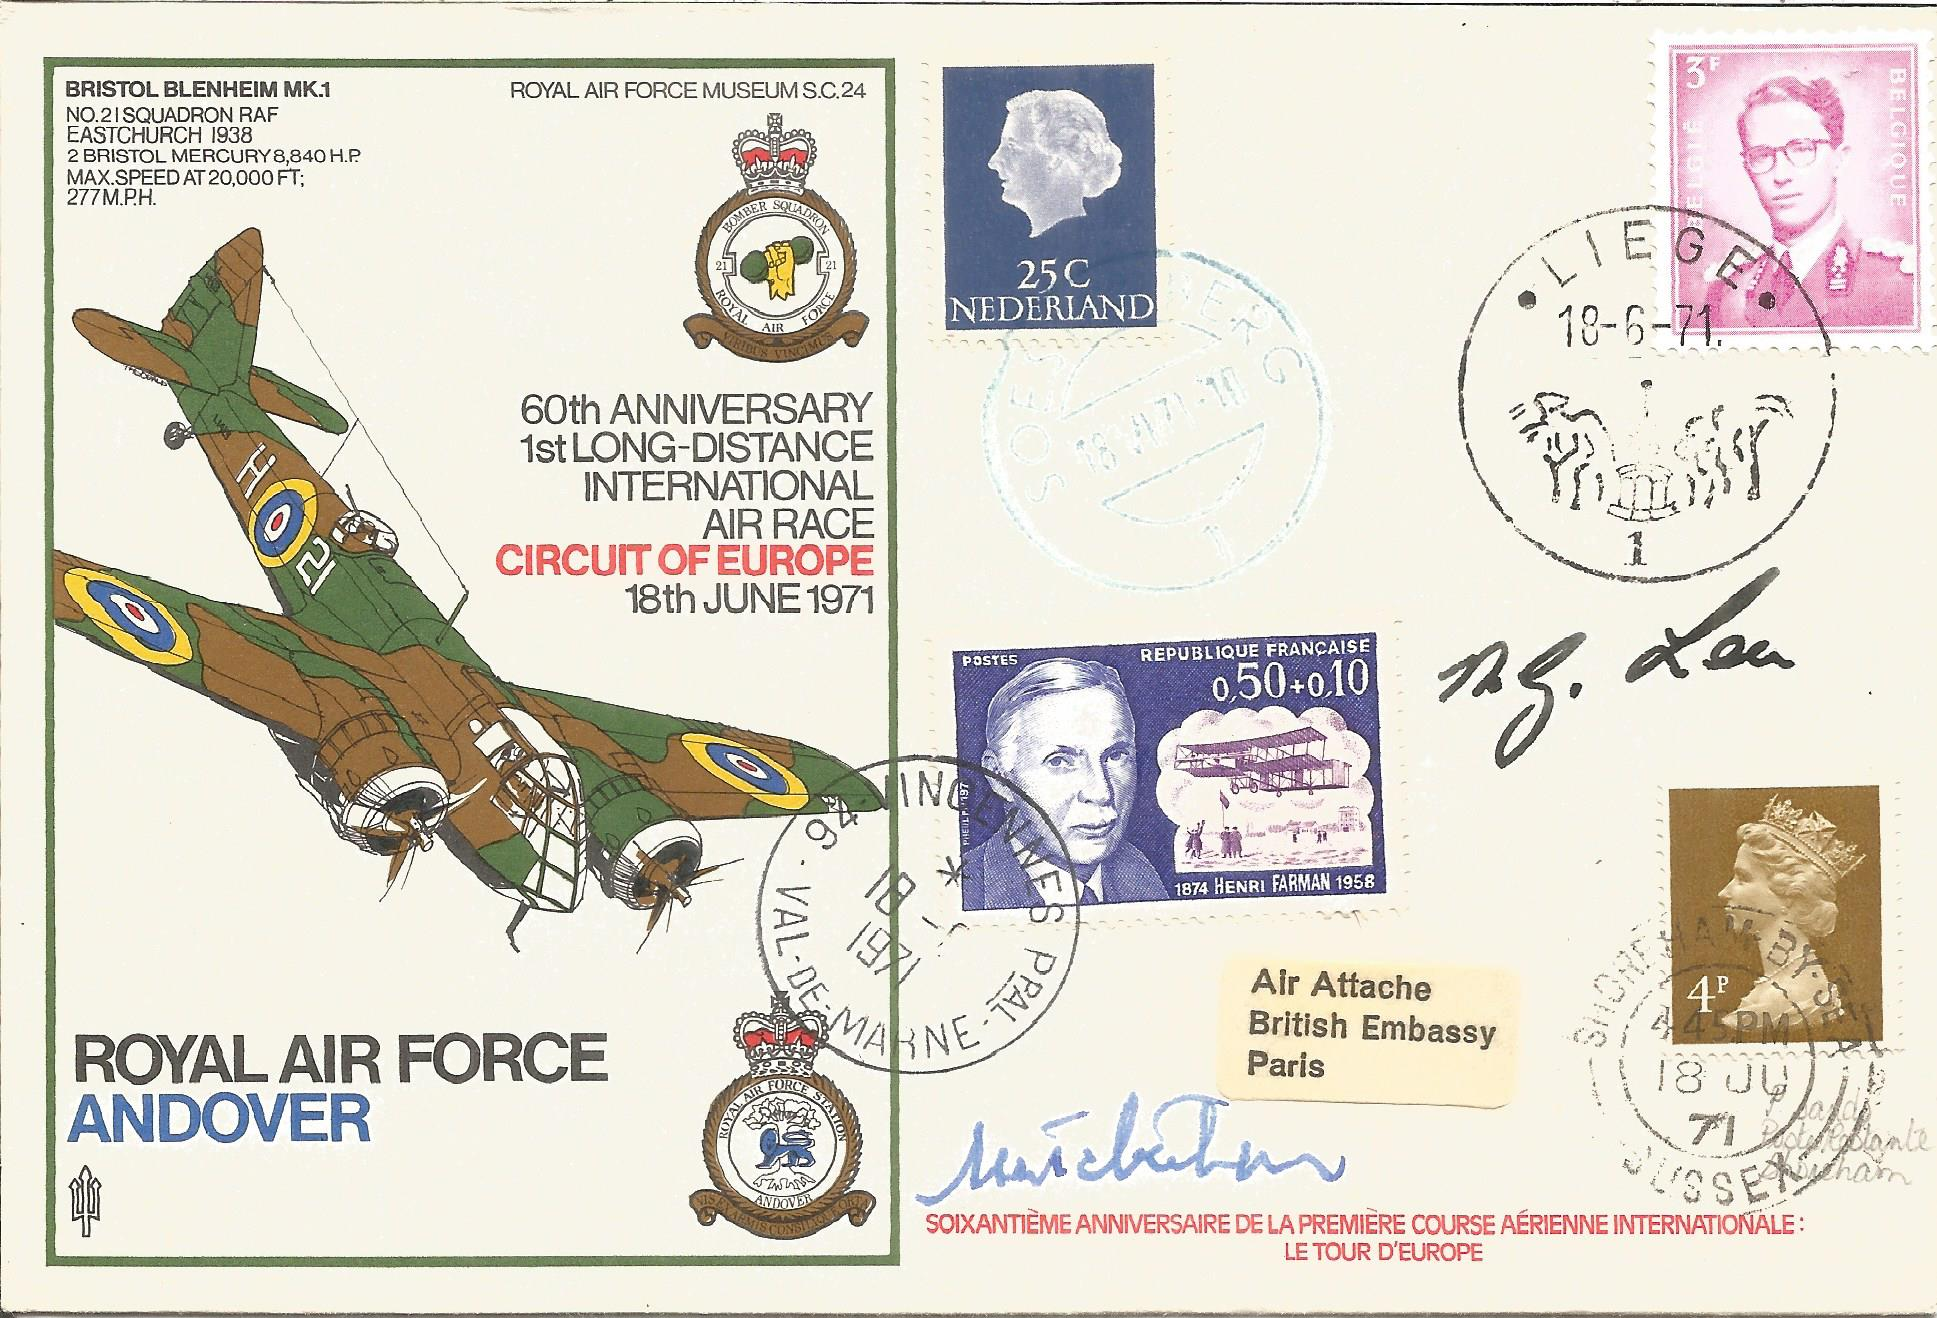 Sqn Ldr N.G. Lea RAF signed RAF Andover 60th Anniversary 1st Long Distance International Air Race